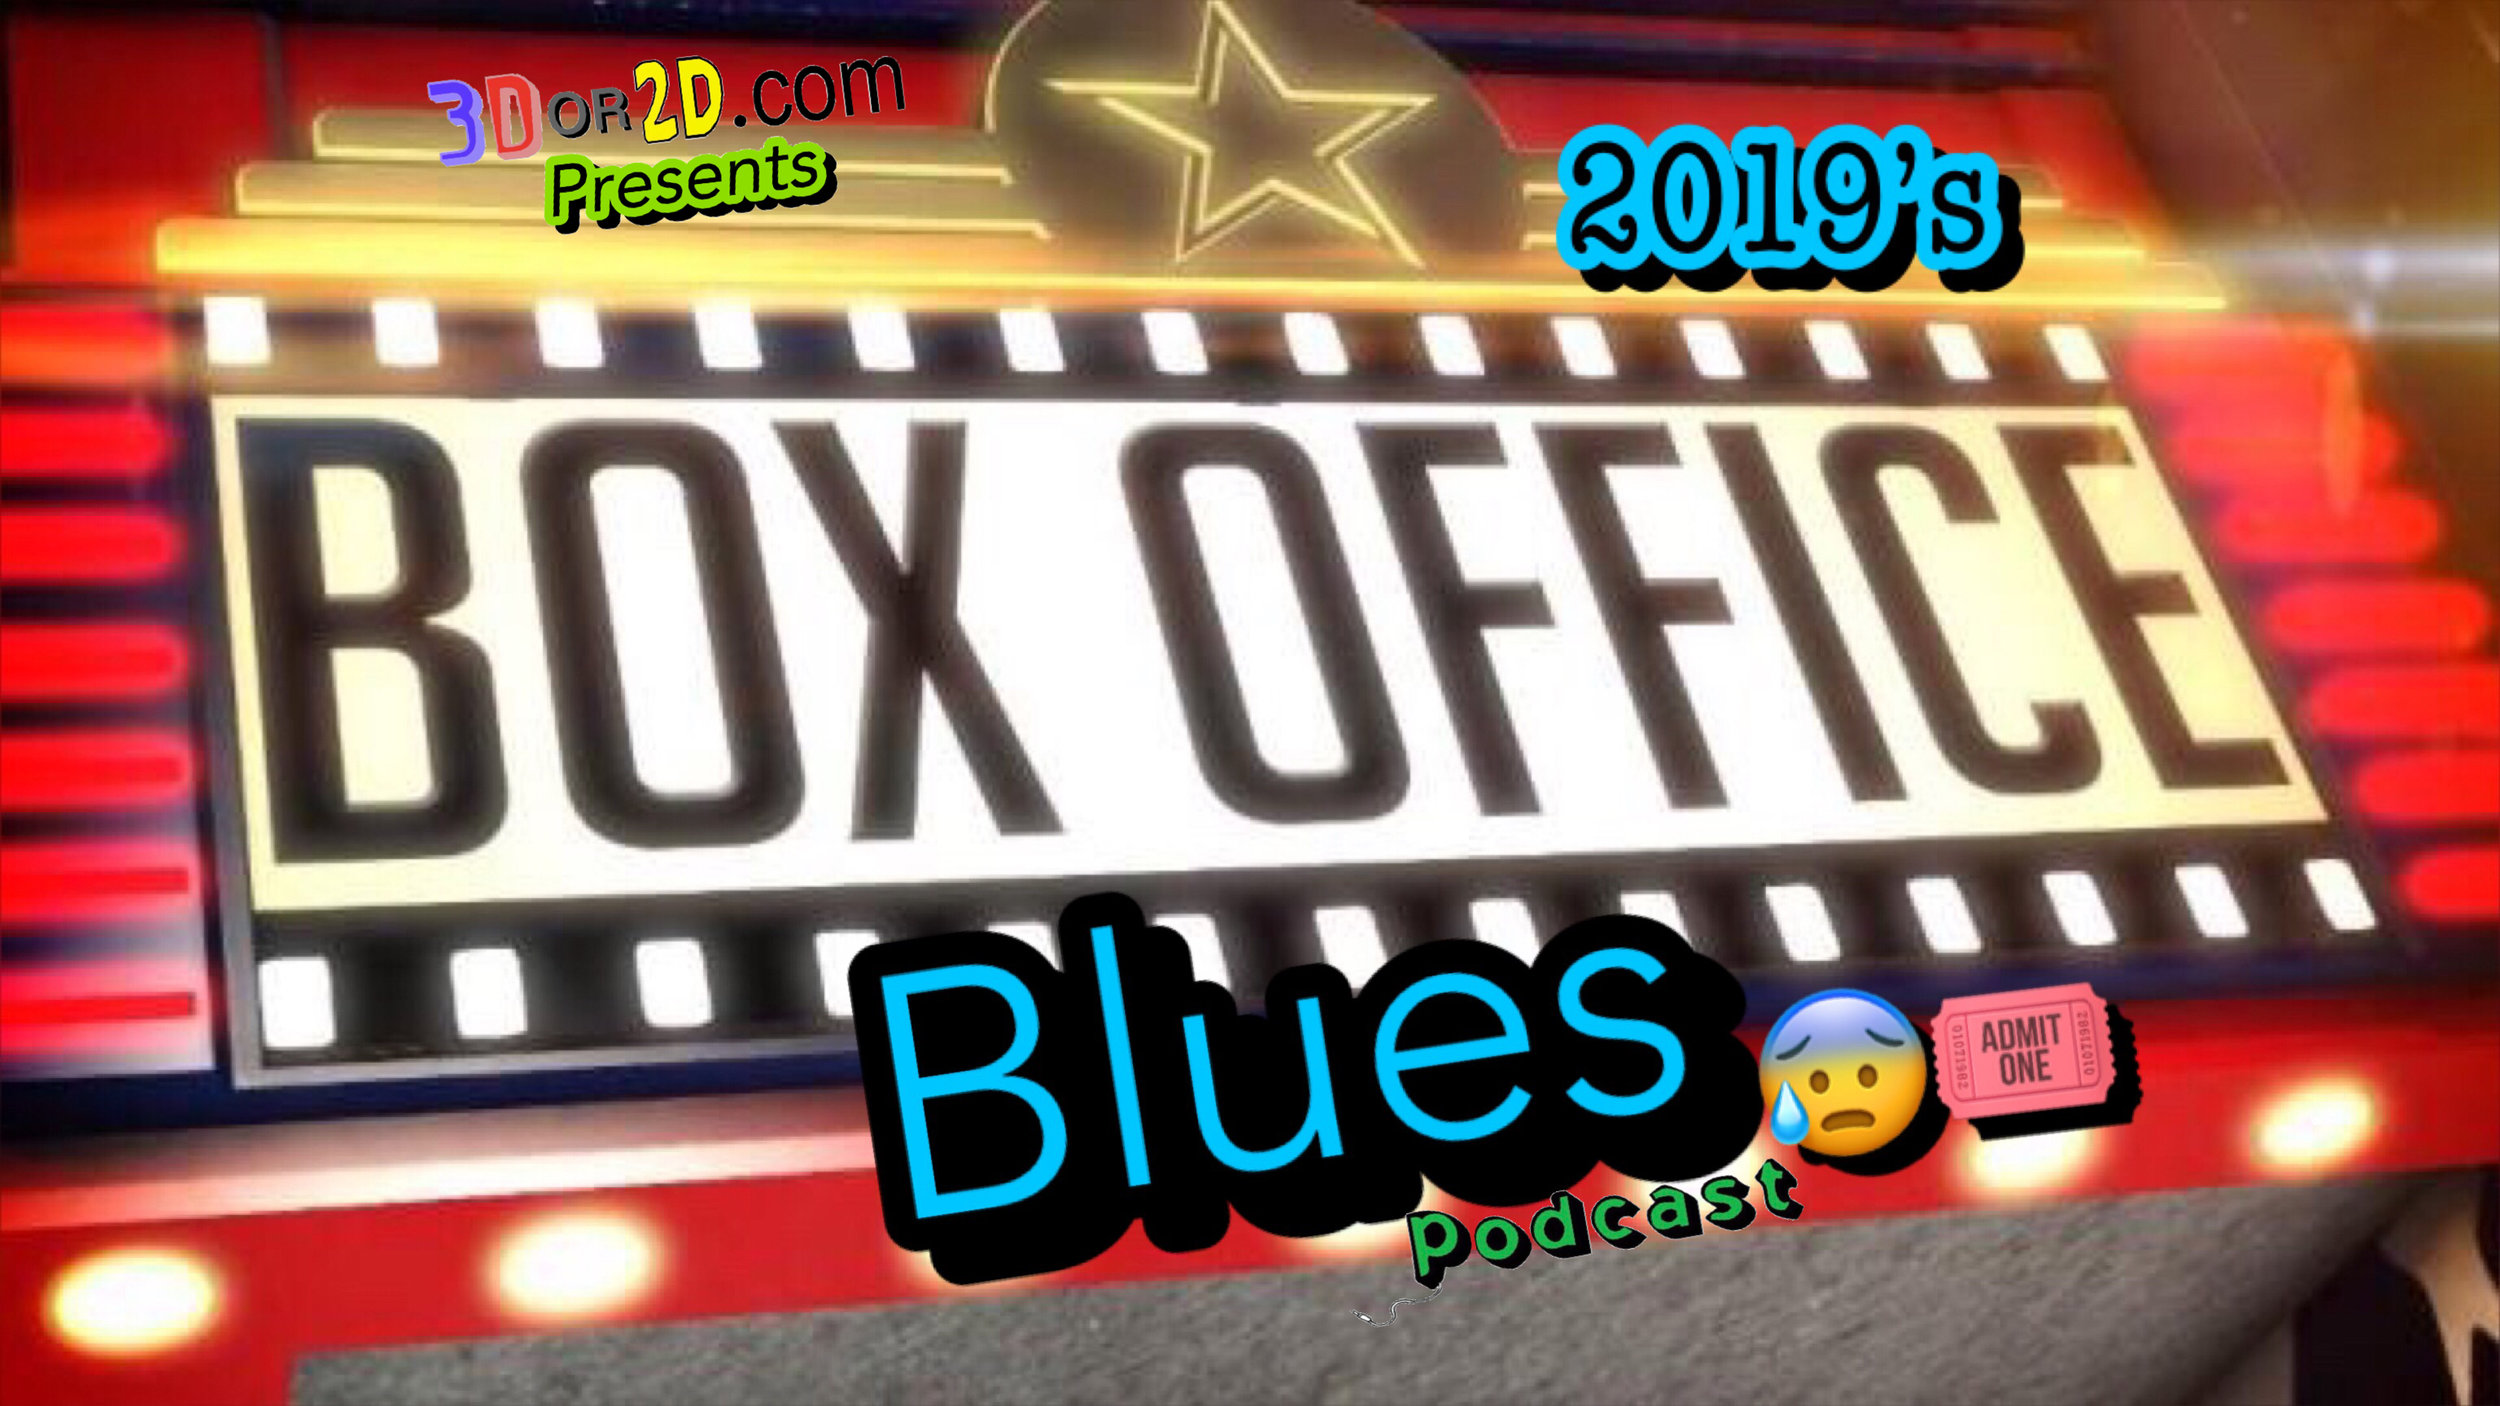 box-office-blues.JPG